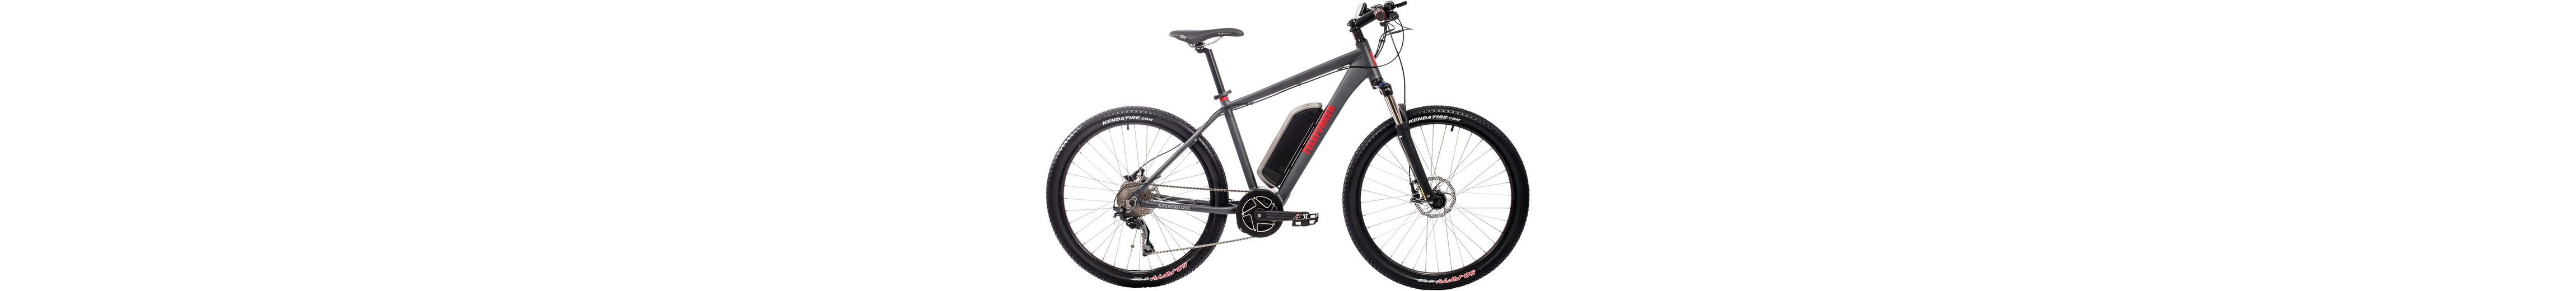 Telefunken Herren Alu Hardtail MTB-E-Bike, 27,5 Z., 10-Gg. Shim. Deore Kettensch., »Aufsteiger M800«